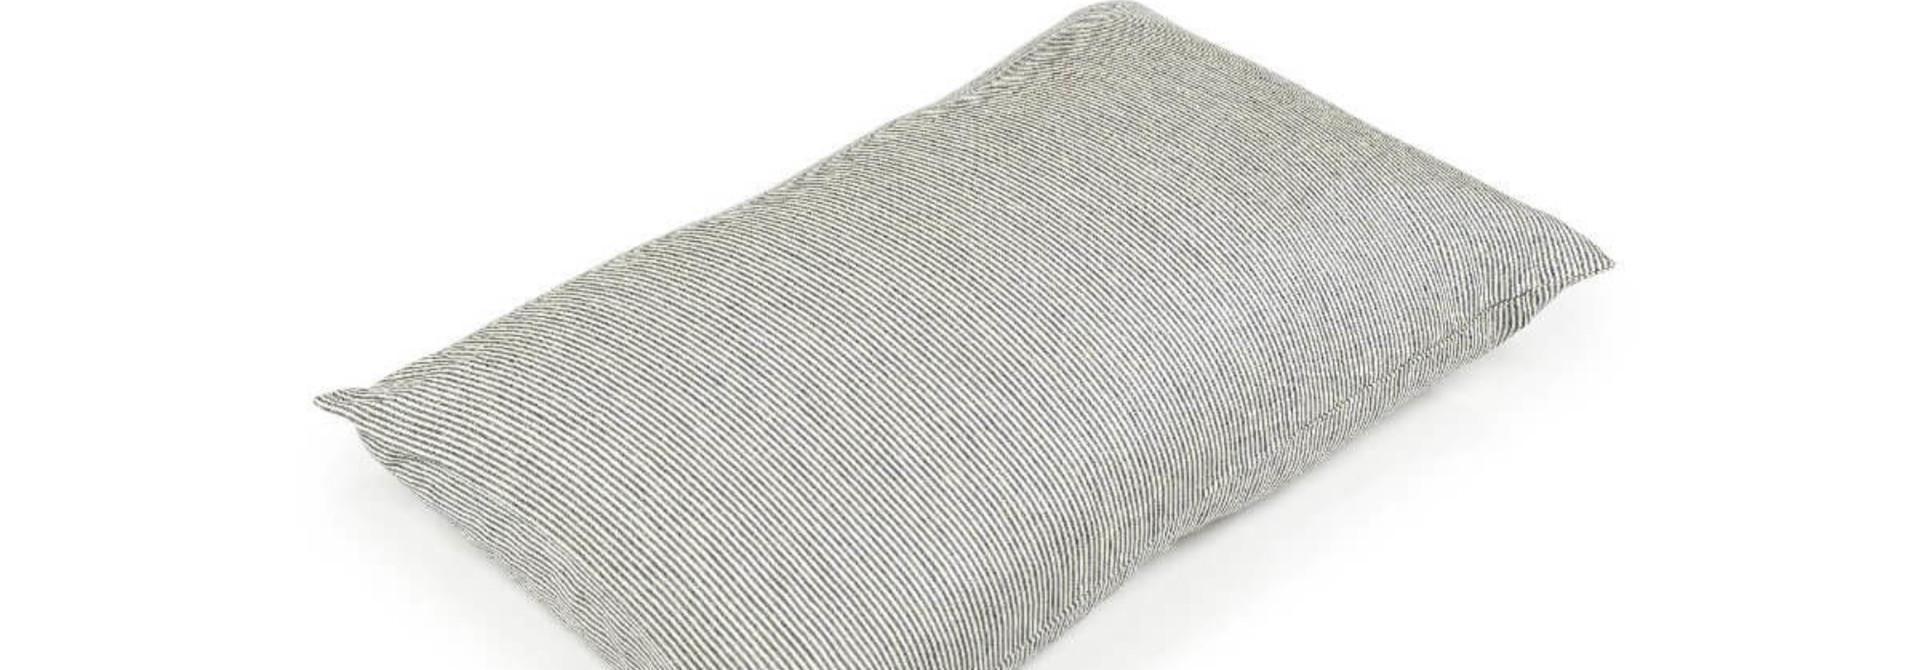 Pillow Sham - The Workshop Stripe